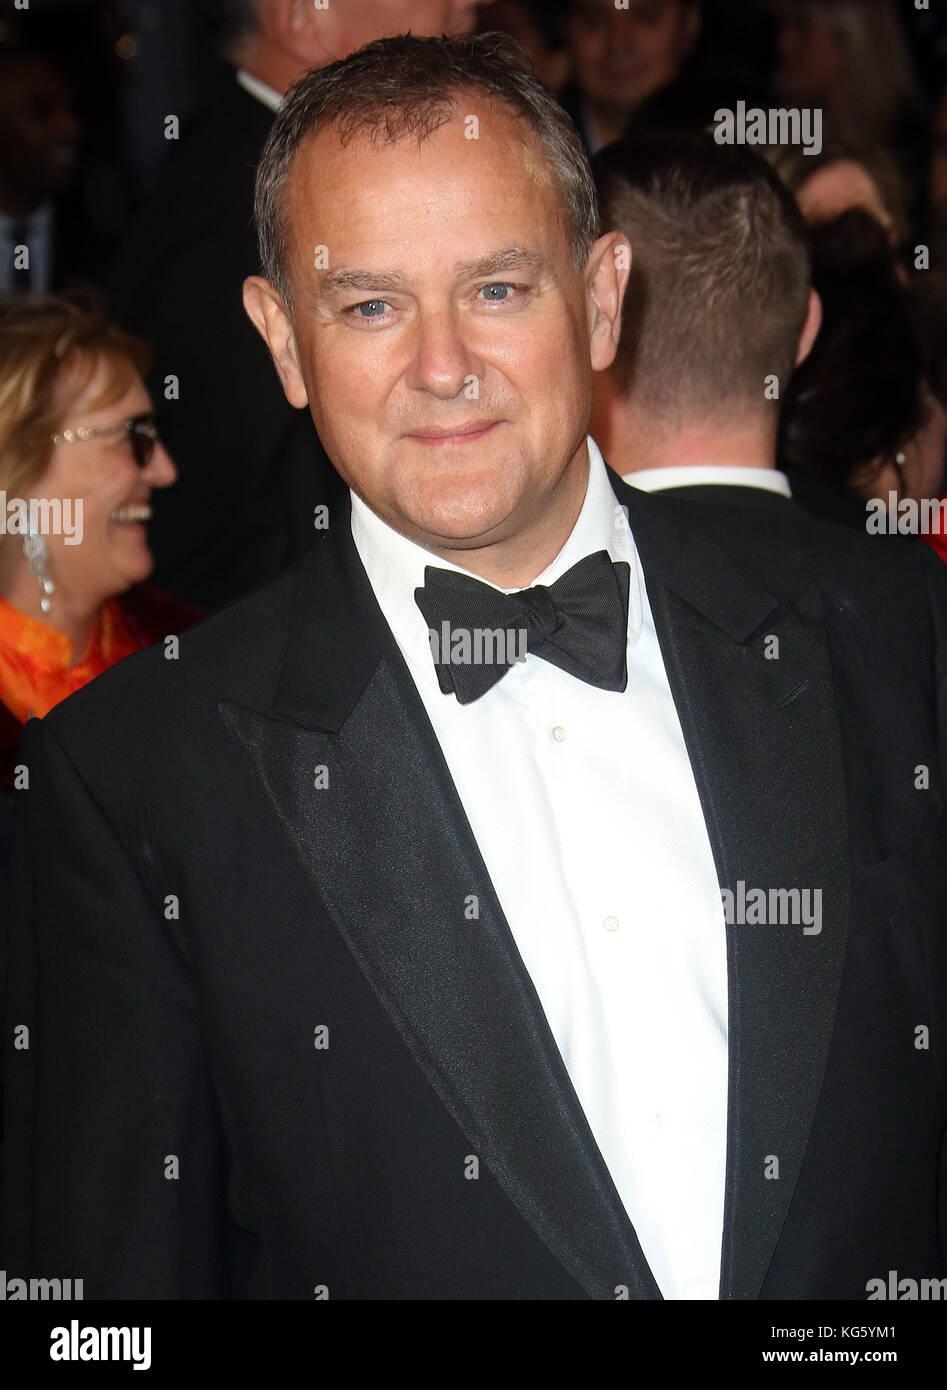 Oct 04, 2017 - Hugh Bonneville attending 'Breathe' European Premiere, Odeon Leicester Square in London, - Stock Image